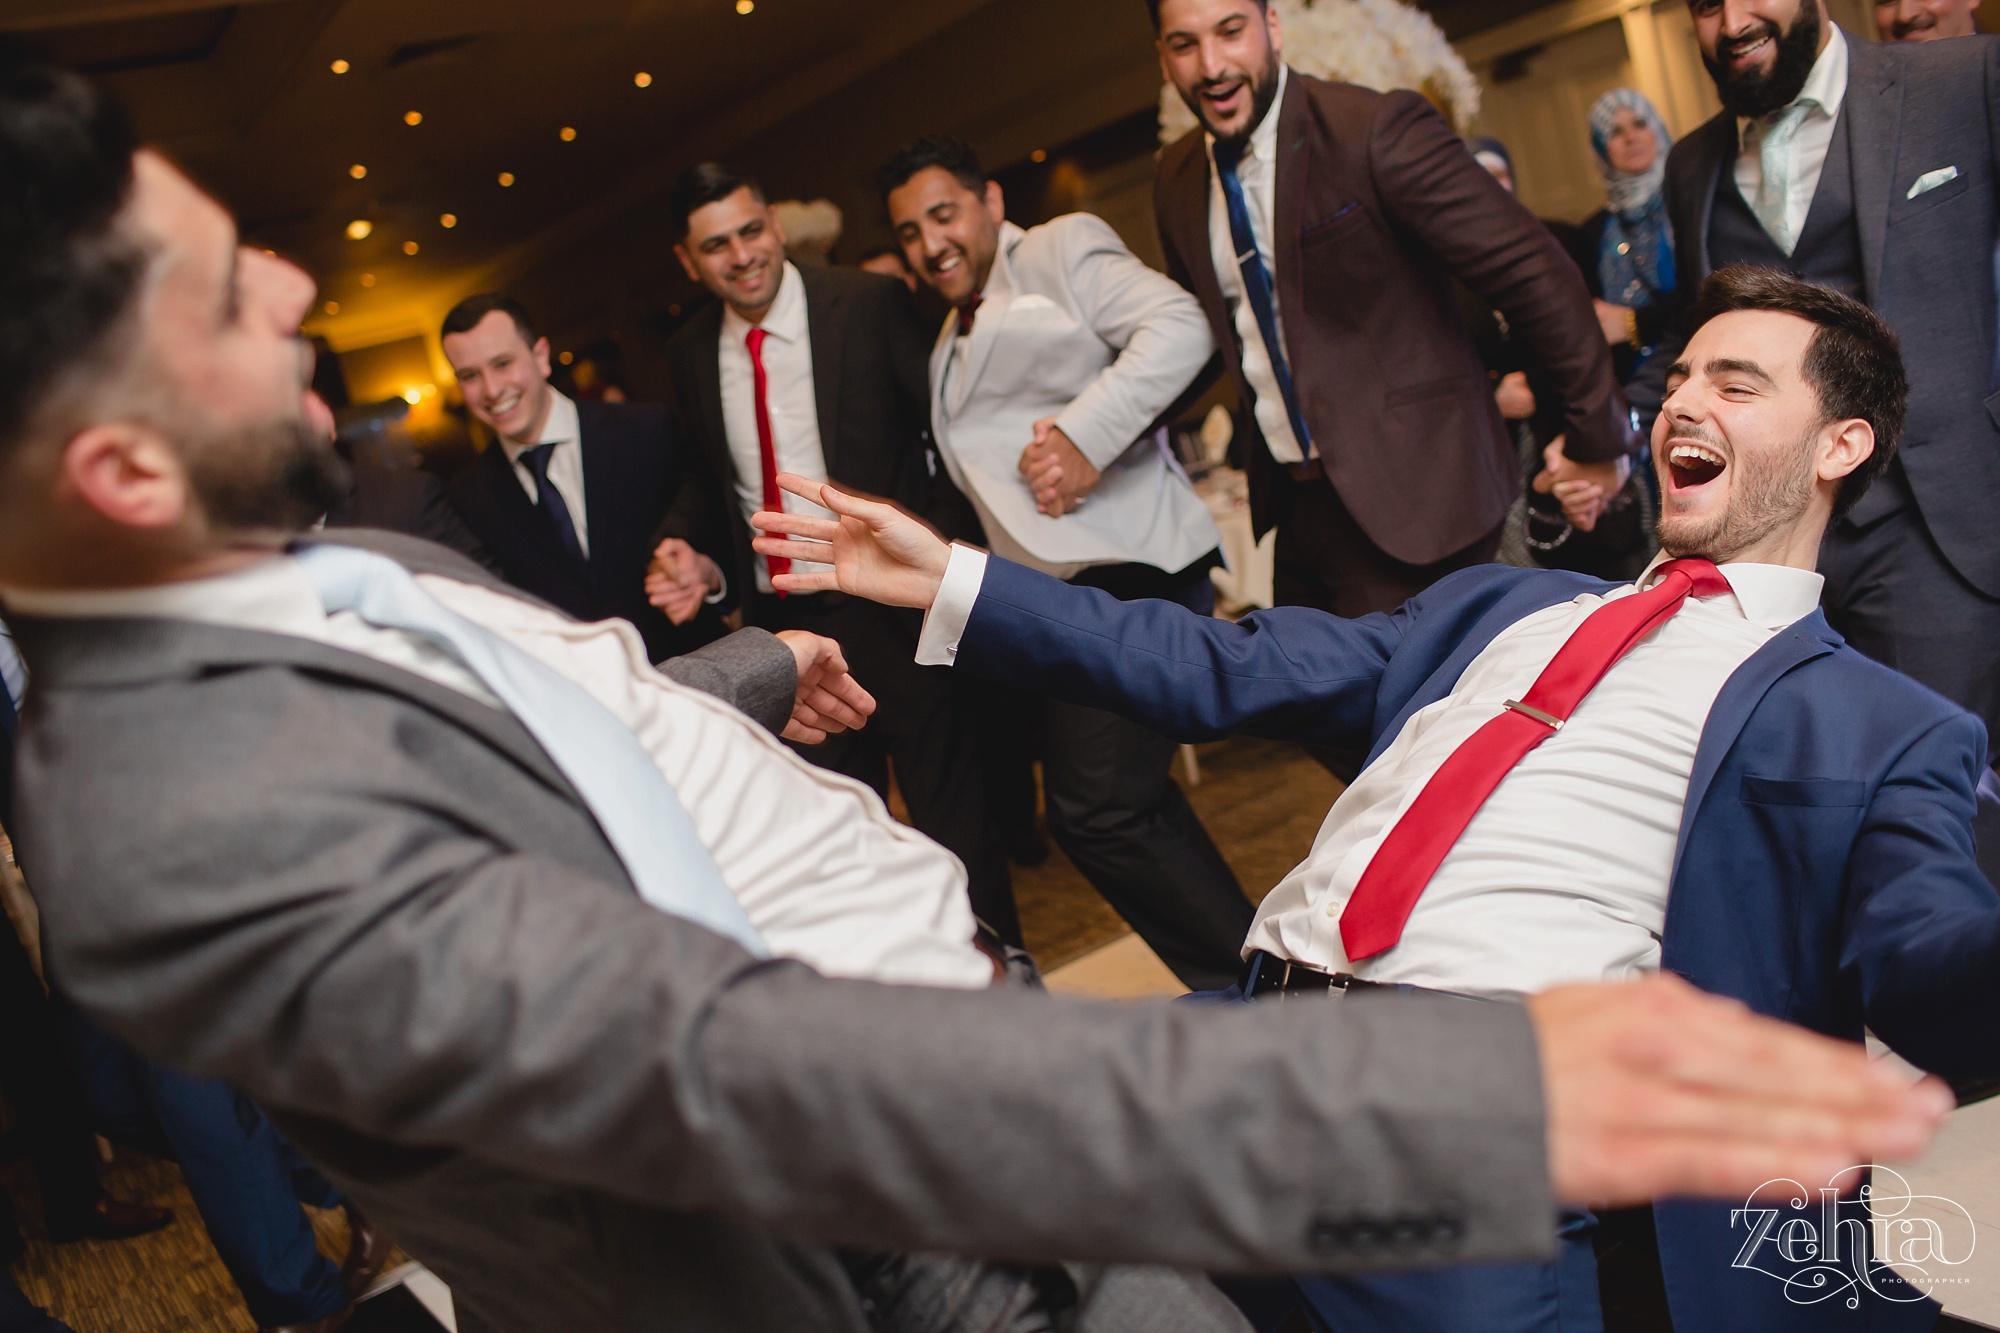 zehra photographer mere cheshire wedding_0038.jpg